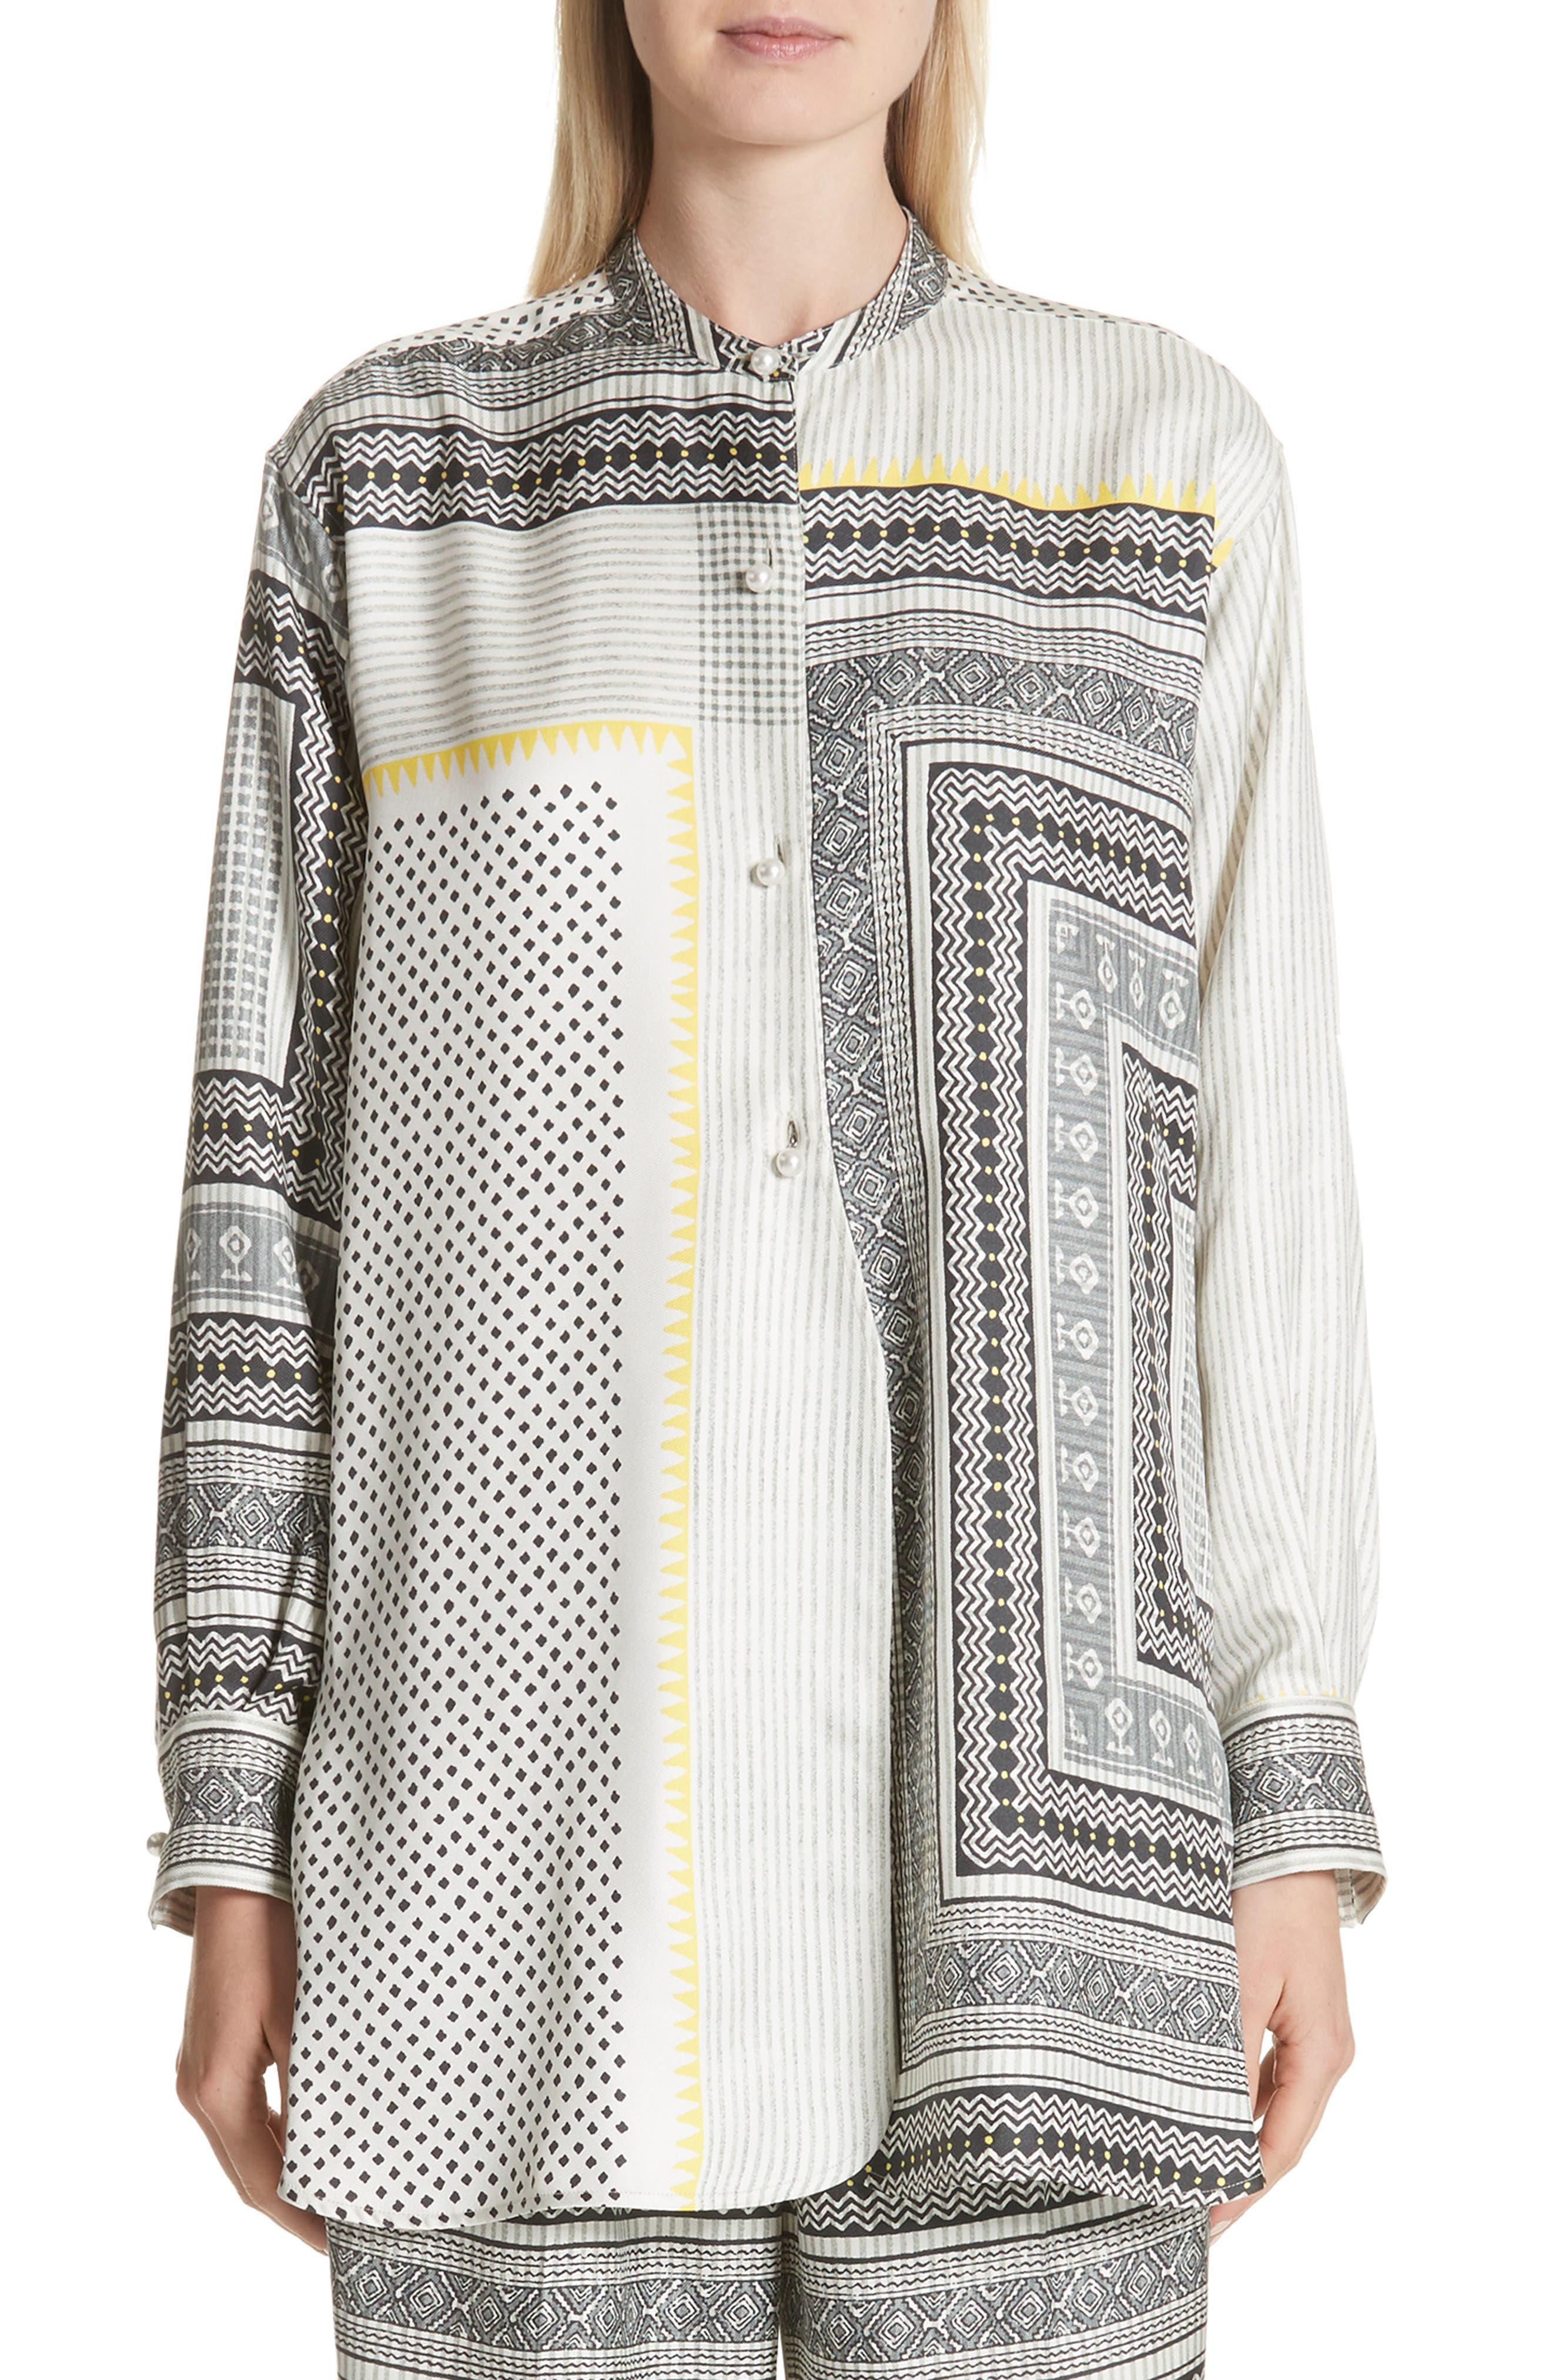 Main Image - Etro Pearl Button Silk Top